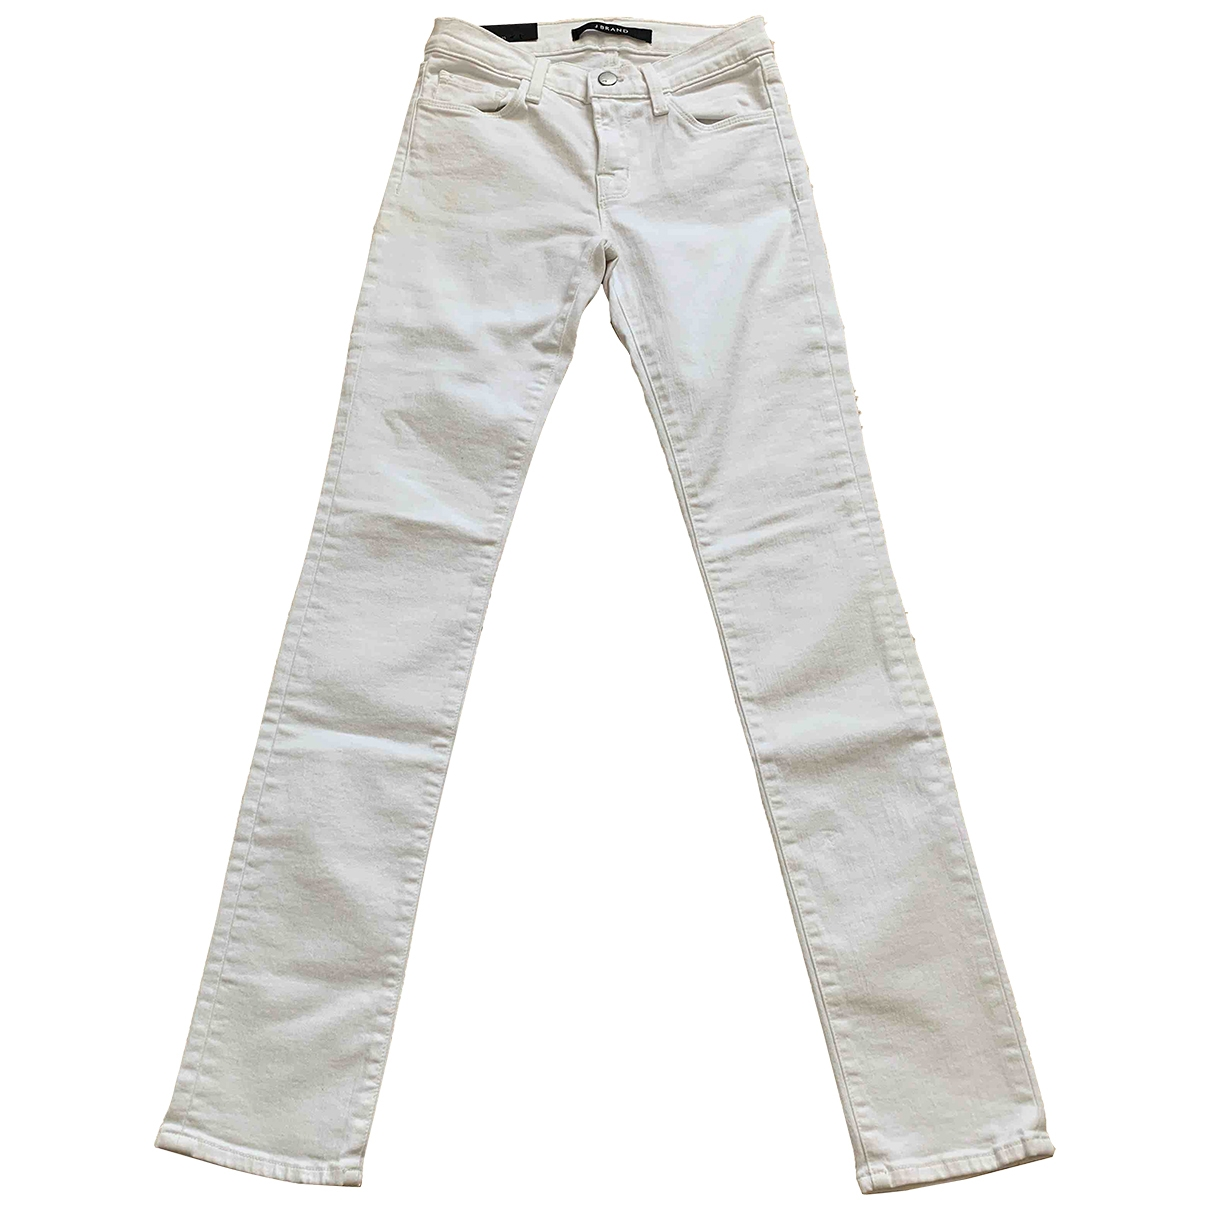 J Brand \N White Cotton - elasthane Jeans for Women 25 US